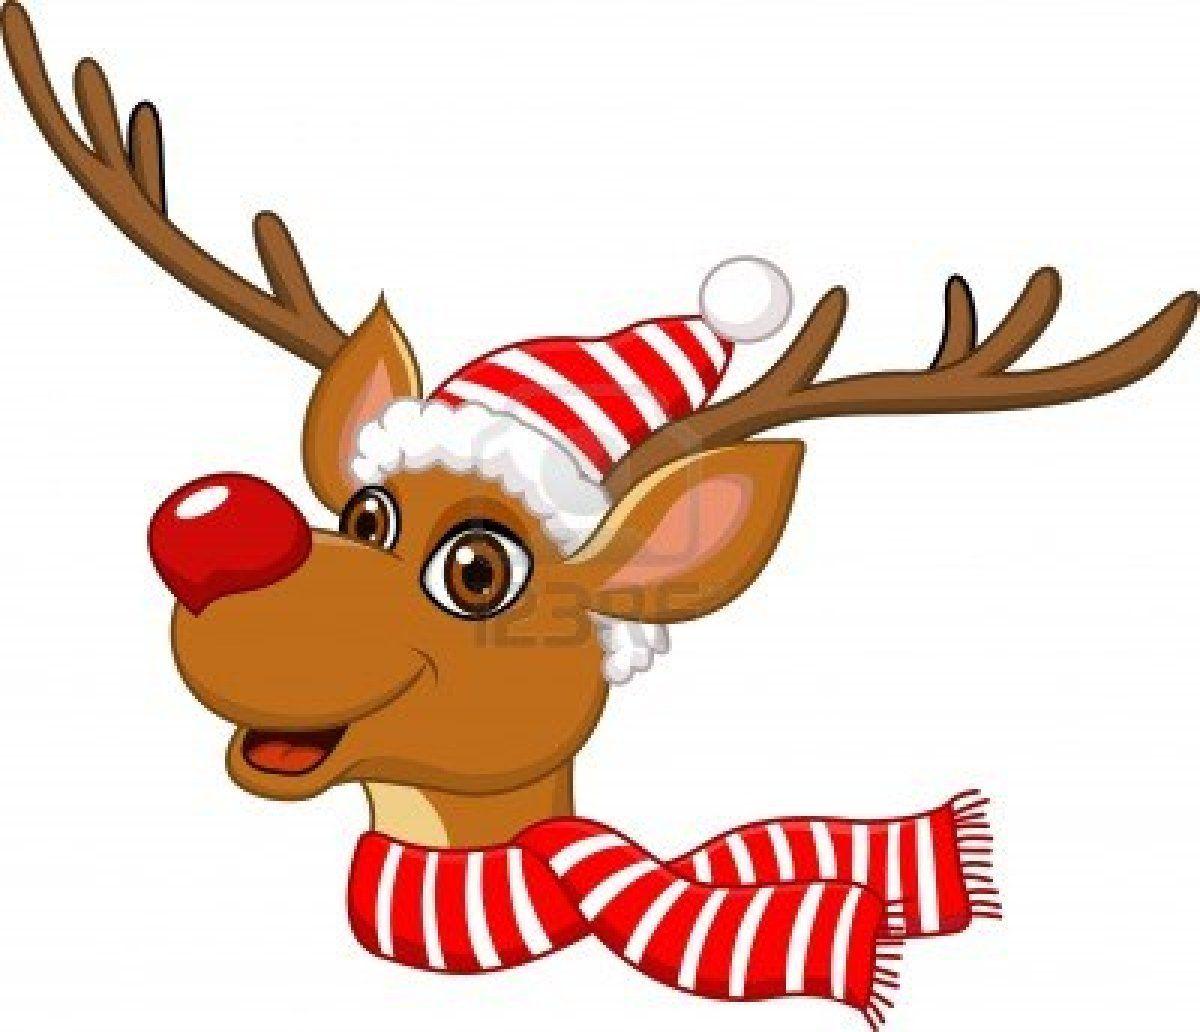 1200x1032 Christmas Deer Clipart 3701572ac8c275372d9b05d3444a30f3